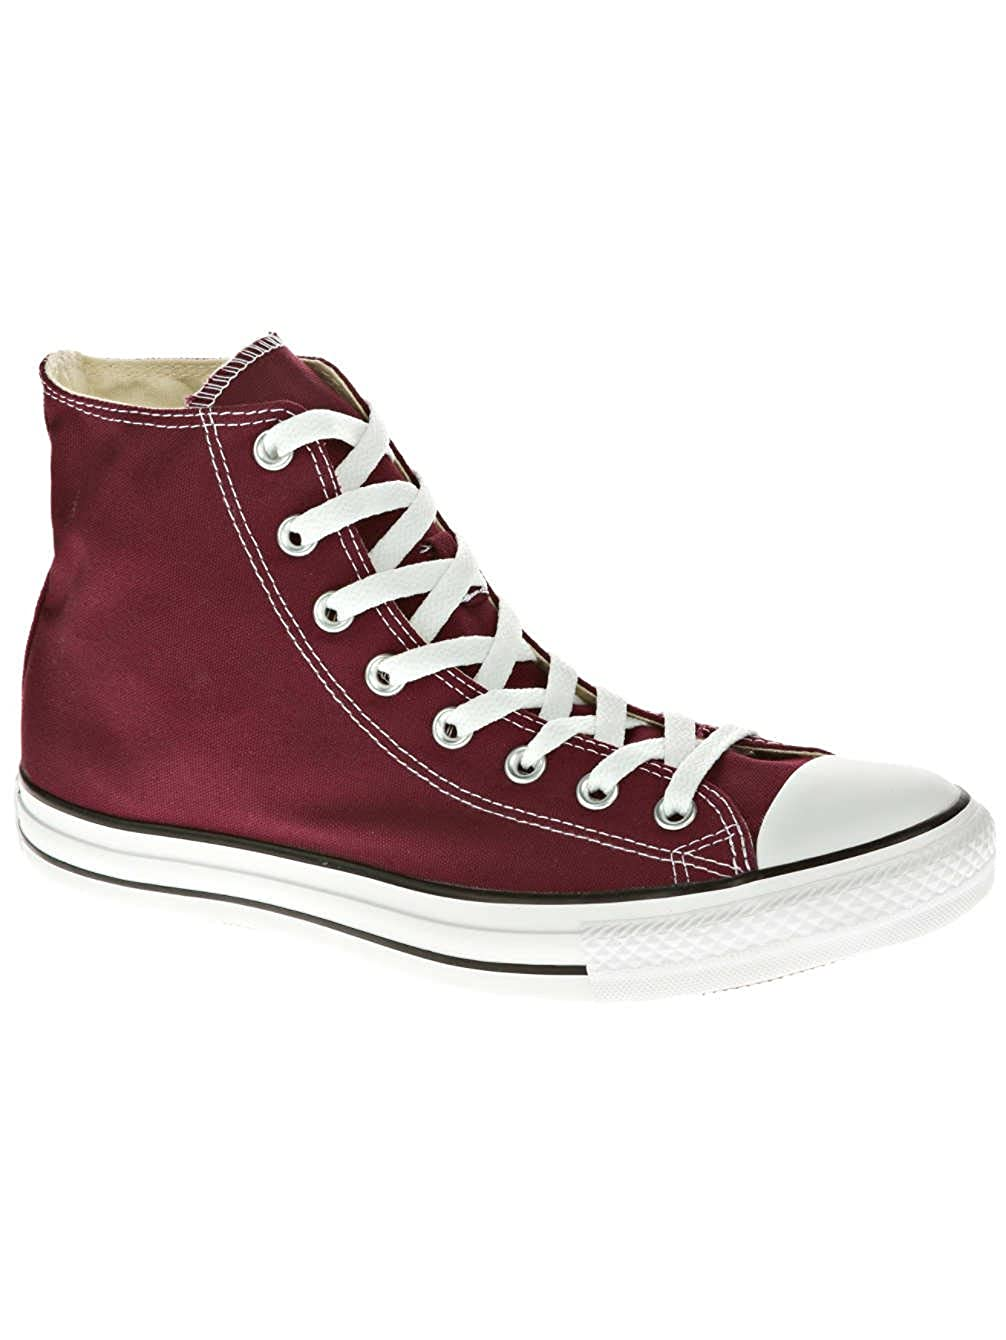 Converse 1J793 AS Hi Can charcoal 1J793 Converse Unisex Erwachsene Sneaker (Burgundy) 5f289c